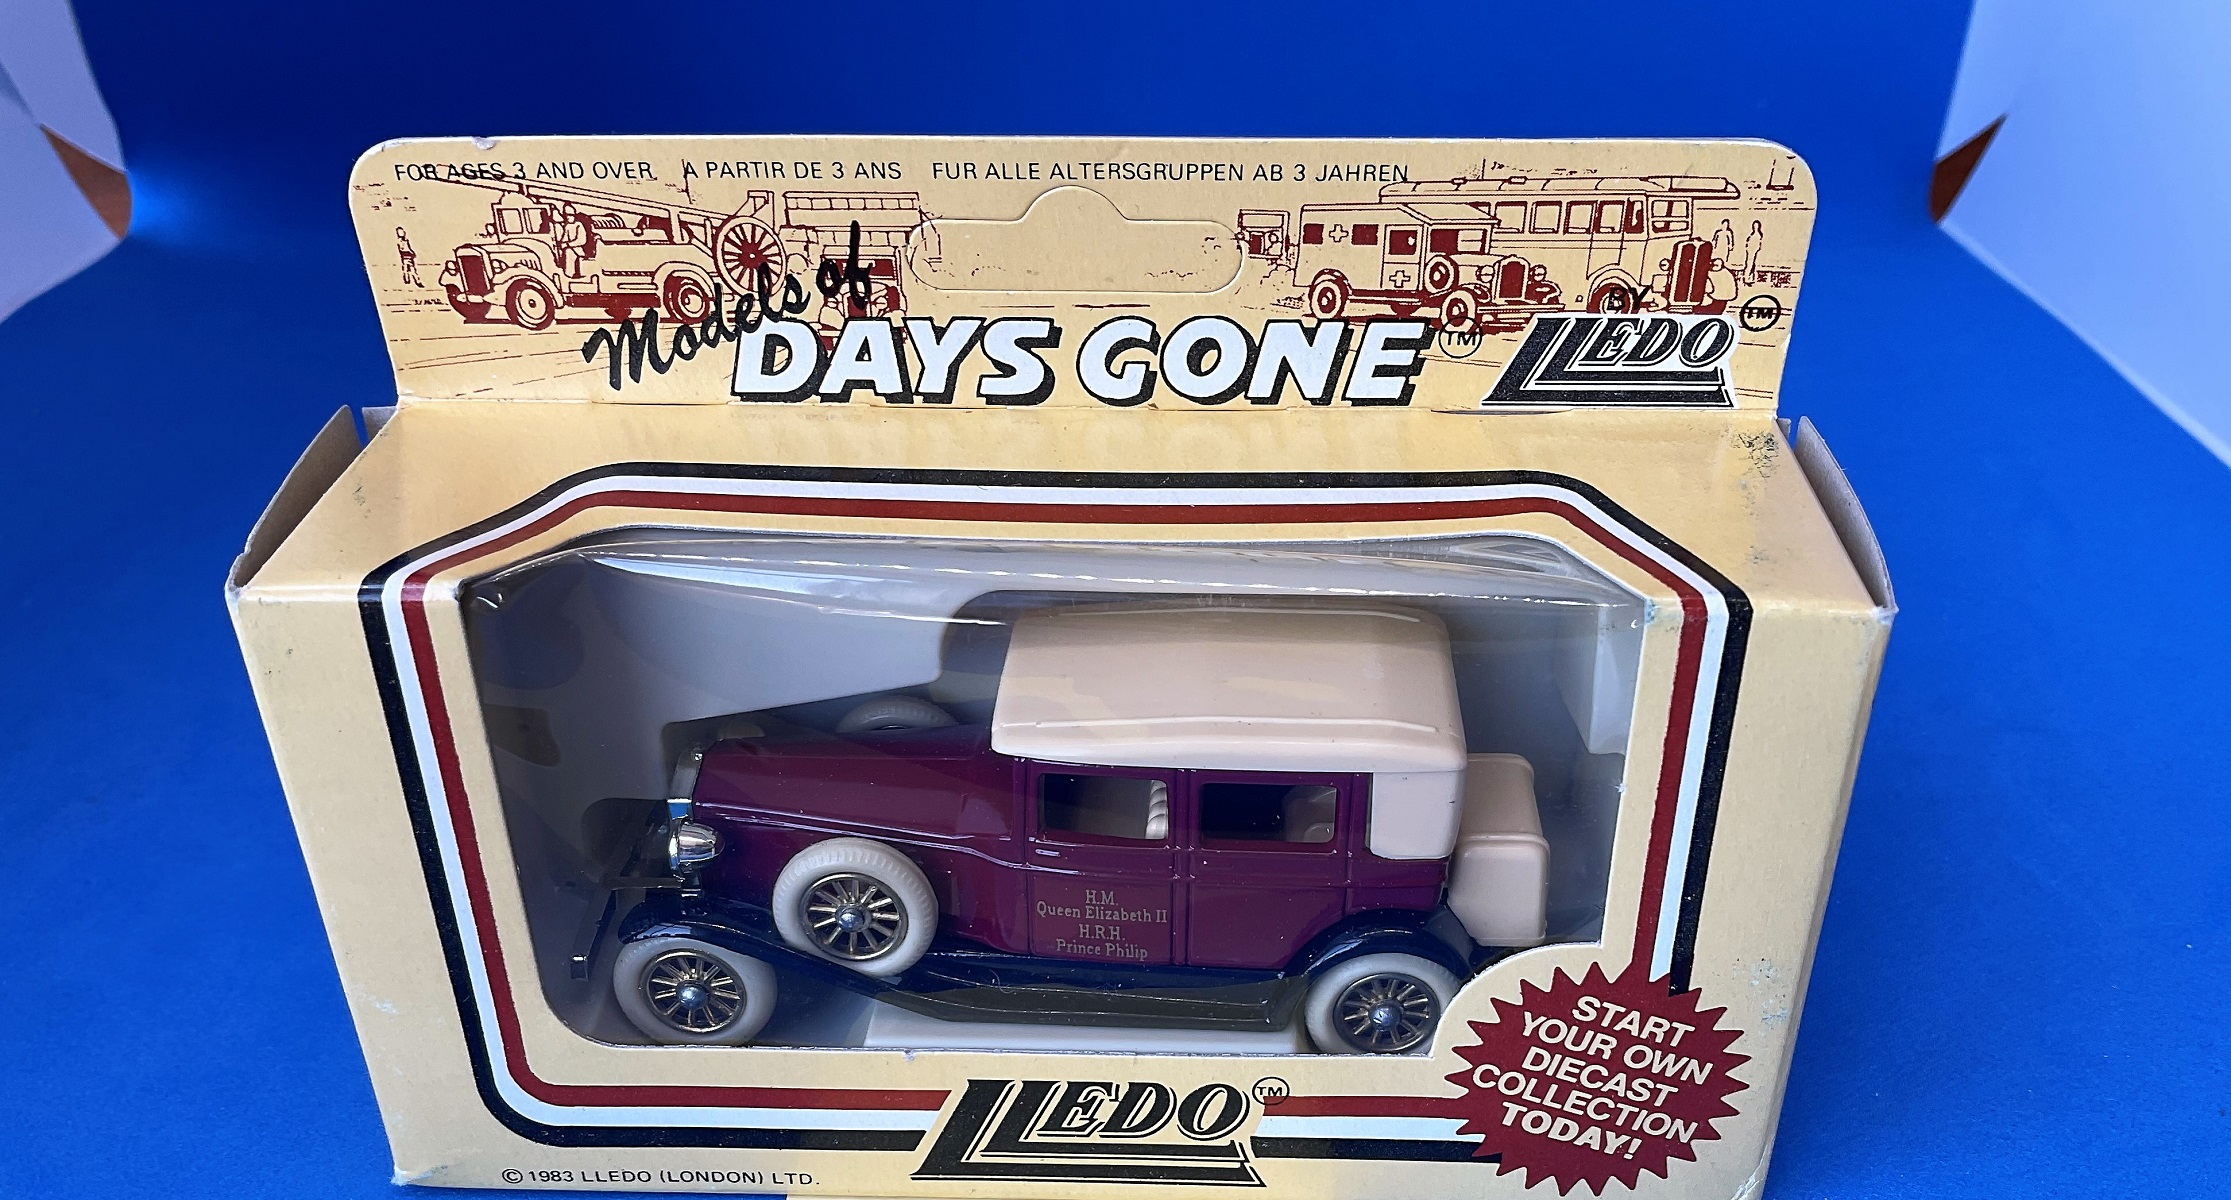 Vintage Toys. Days Gone vintage Models. HM Queen Elizabeth II and HRH Prince Philip retro car. Die-